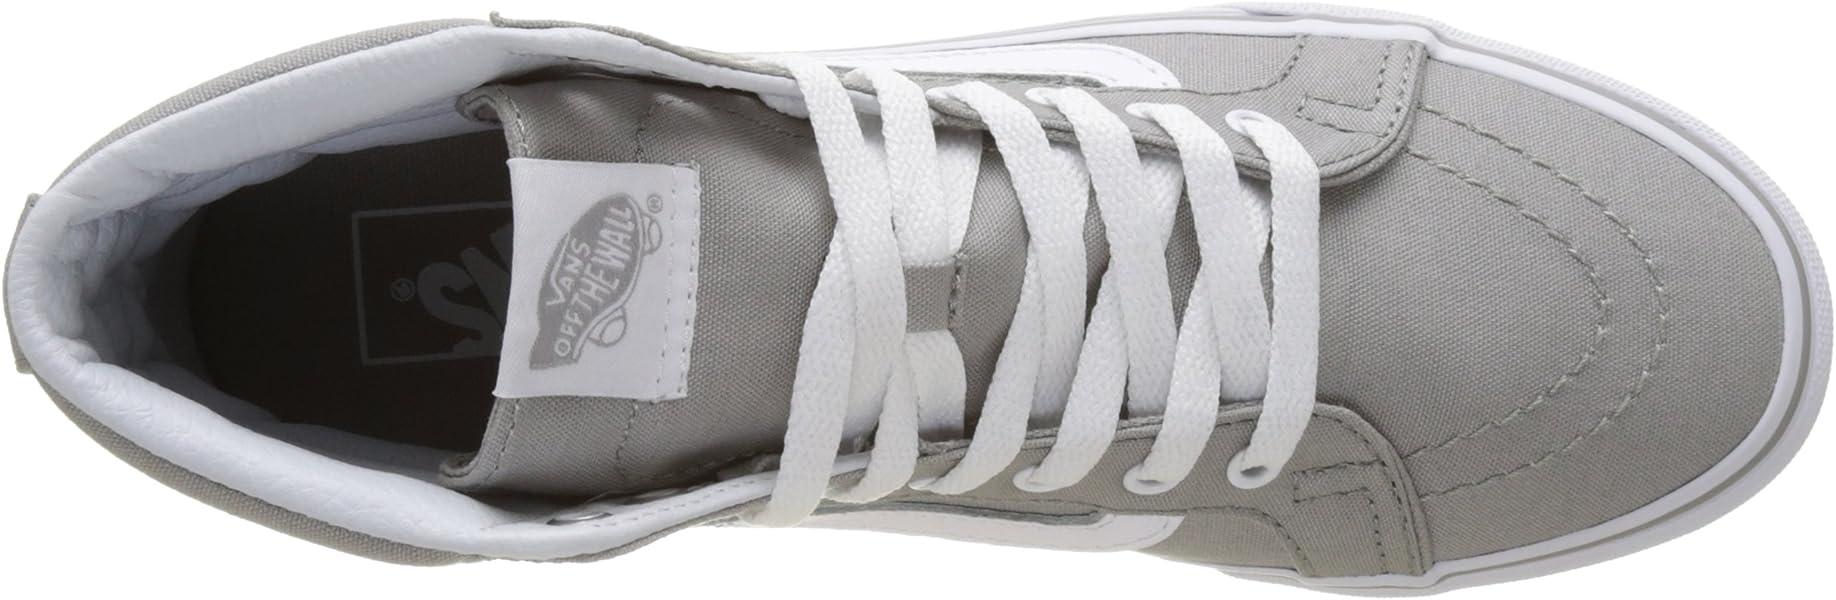 c93c8767bf Vans Damen Ua Sk8-hi Slim Hohe Sneakers Grau (Drizzle True White ...